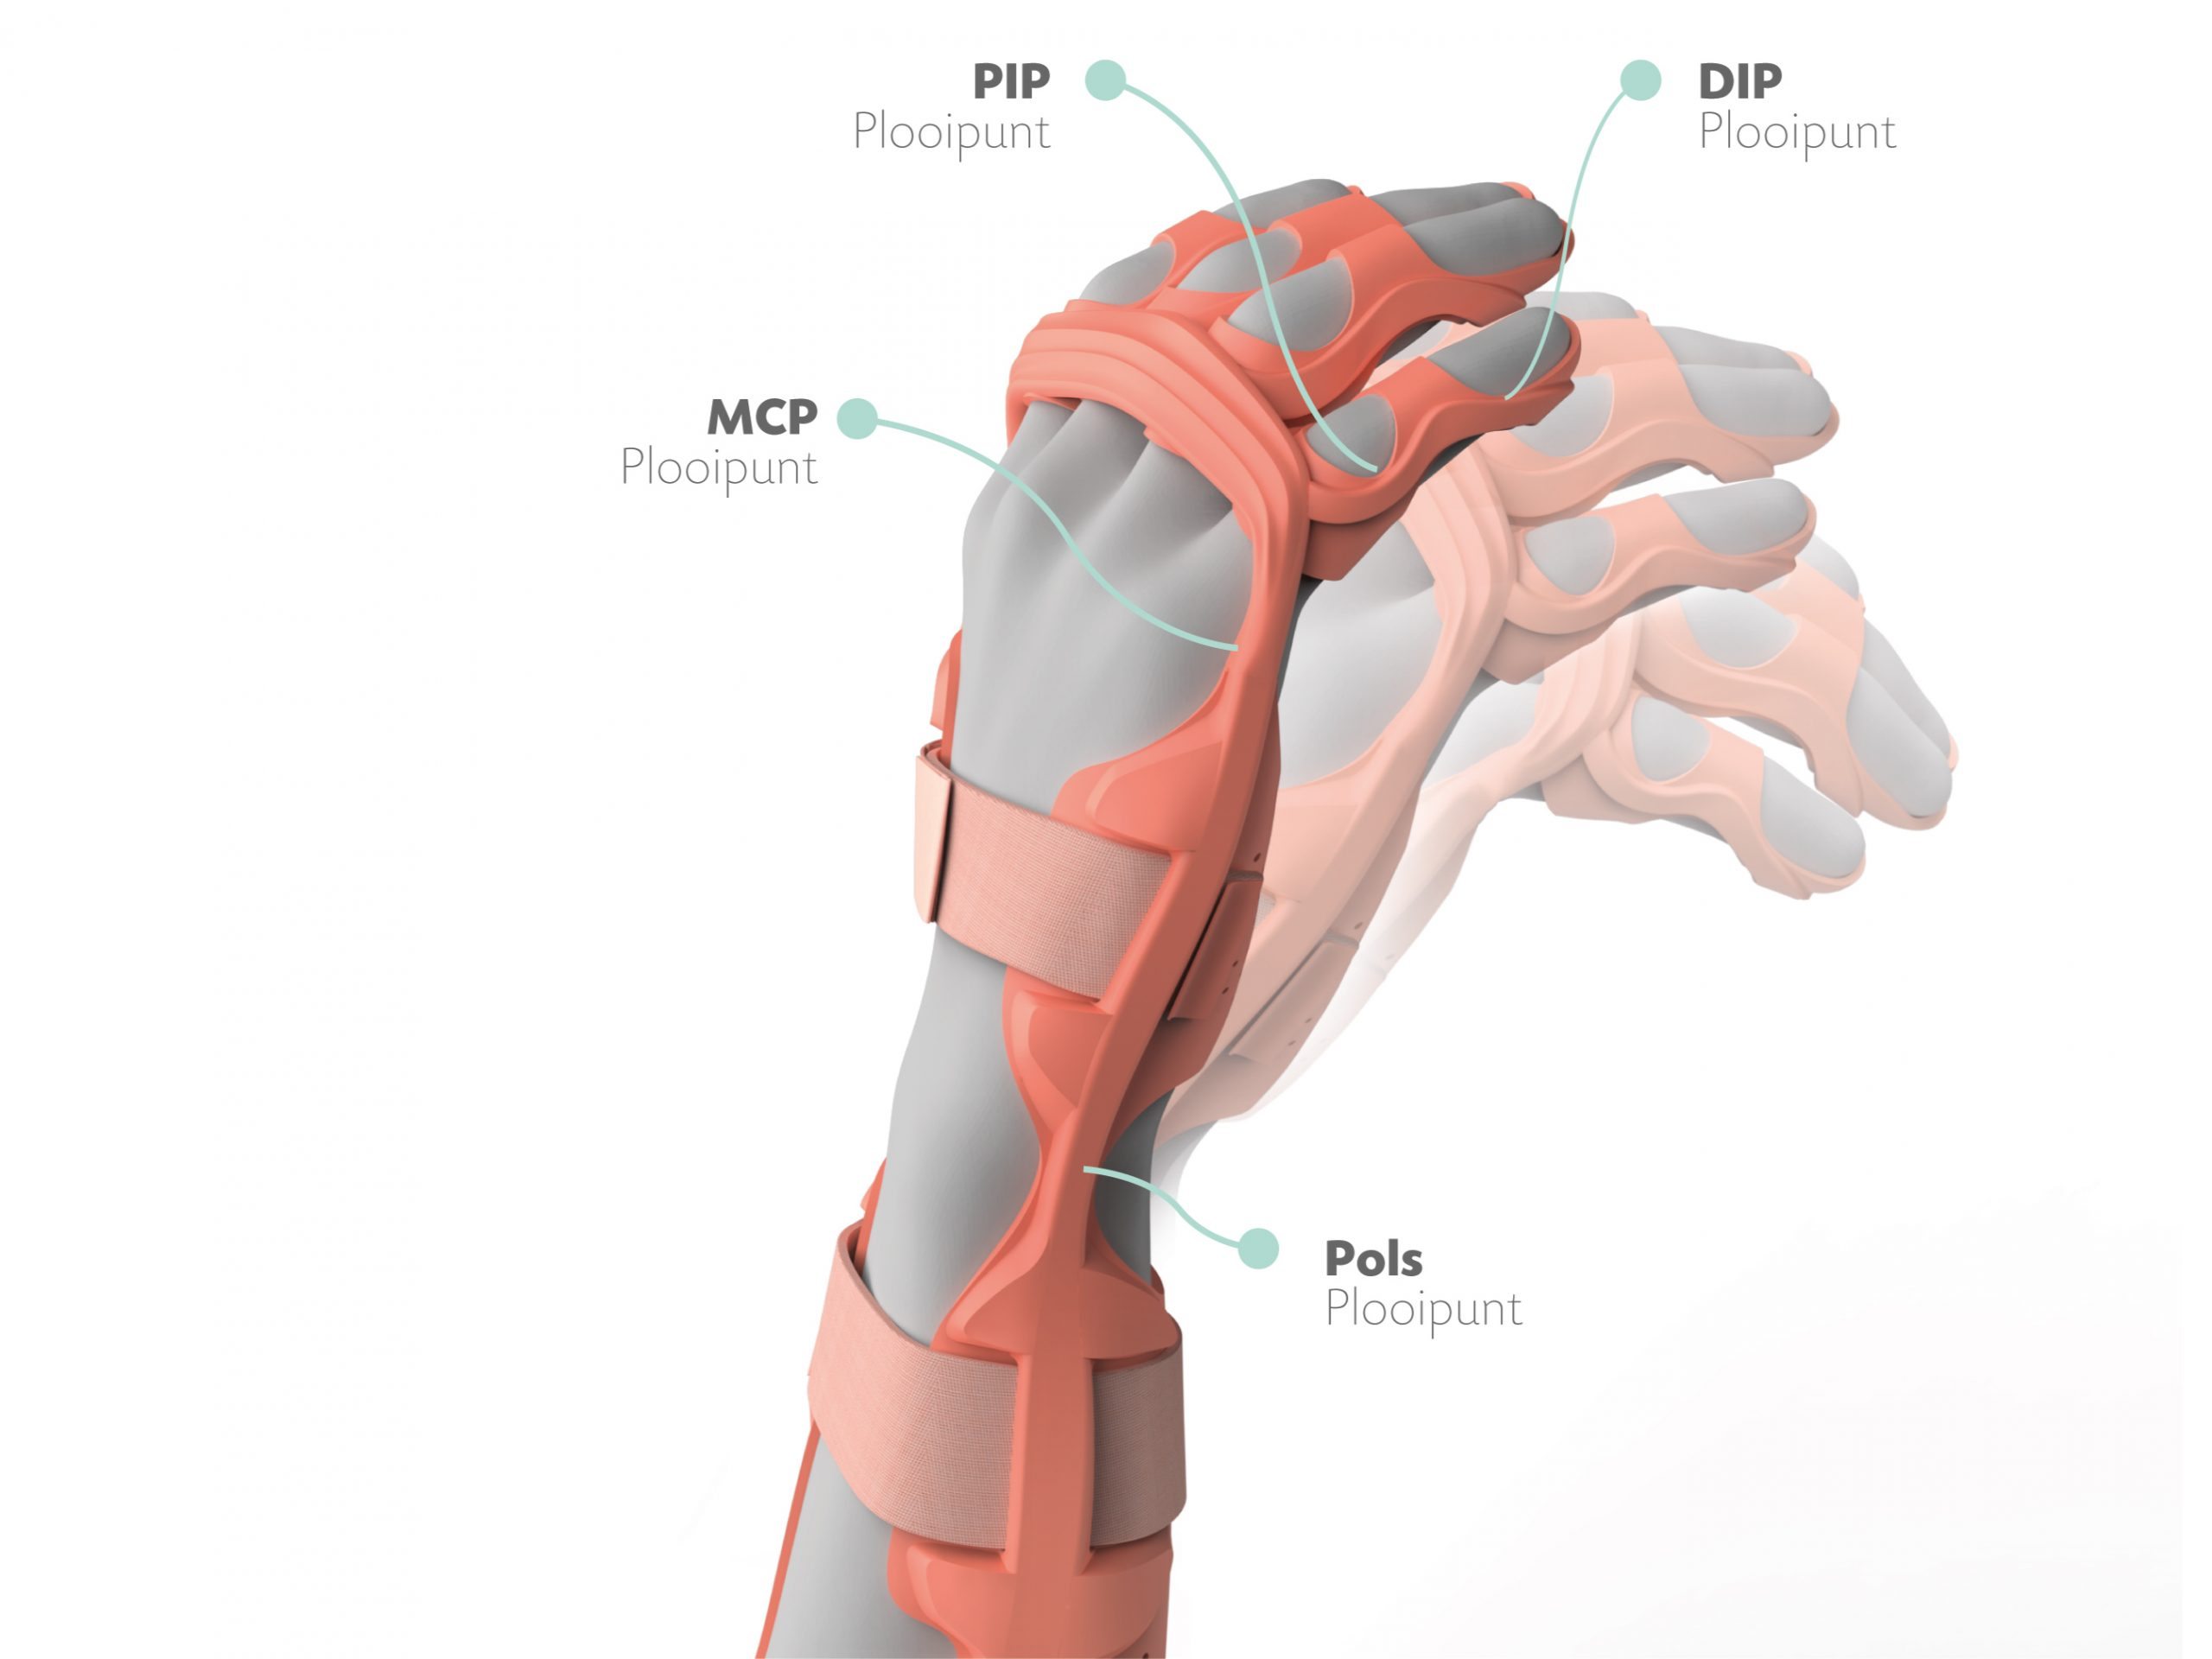 ManiFlex is a dynamic orthosis that allows for limited movement. Photo via Mano Balliu/James Dyson Award.